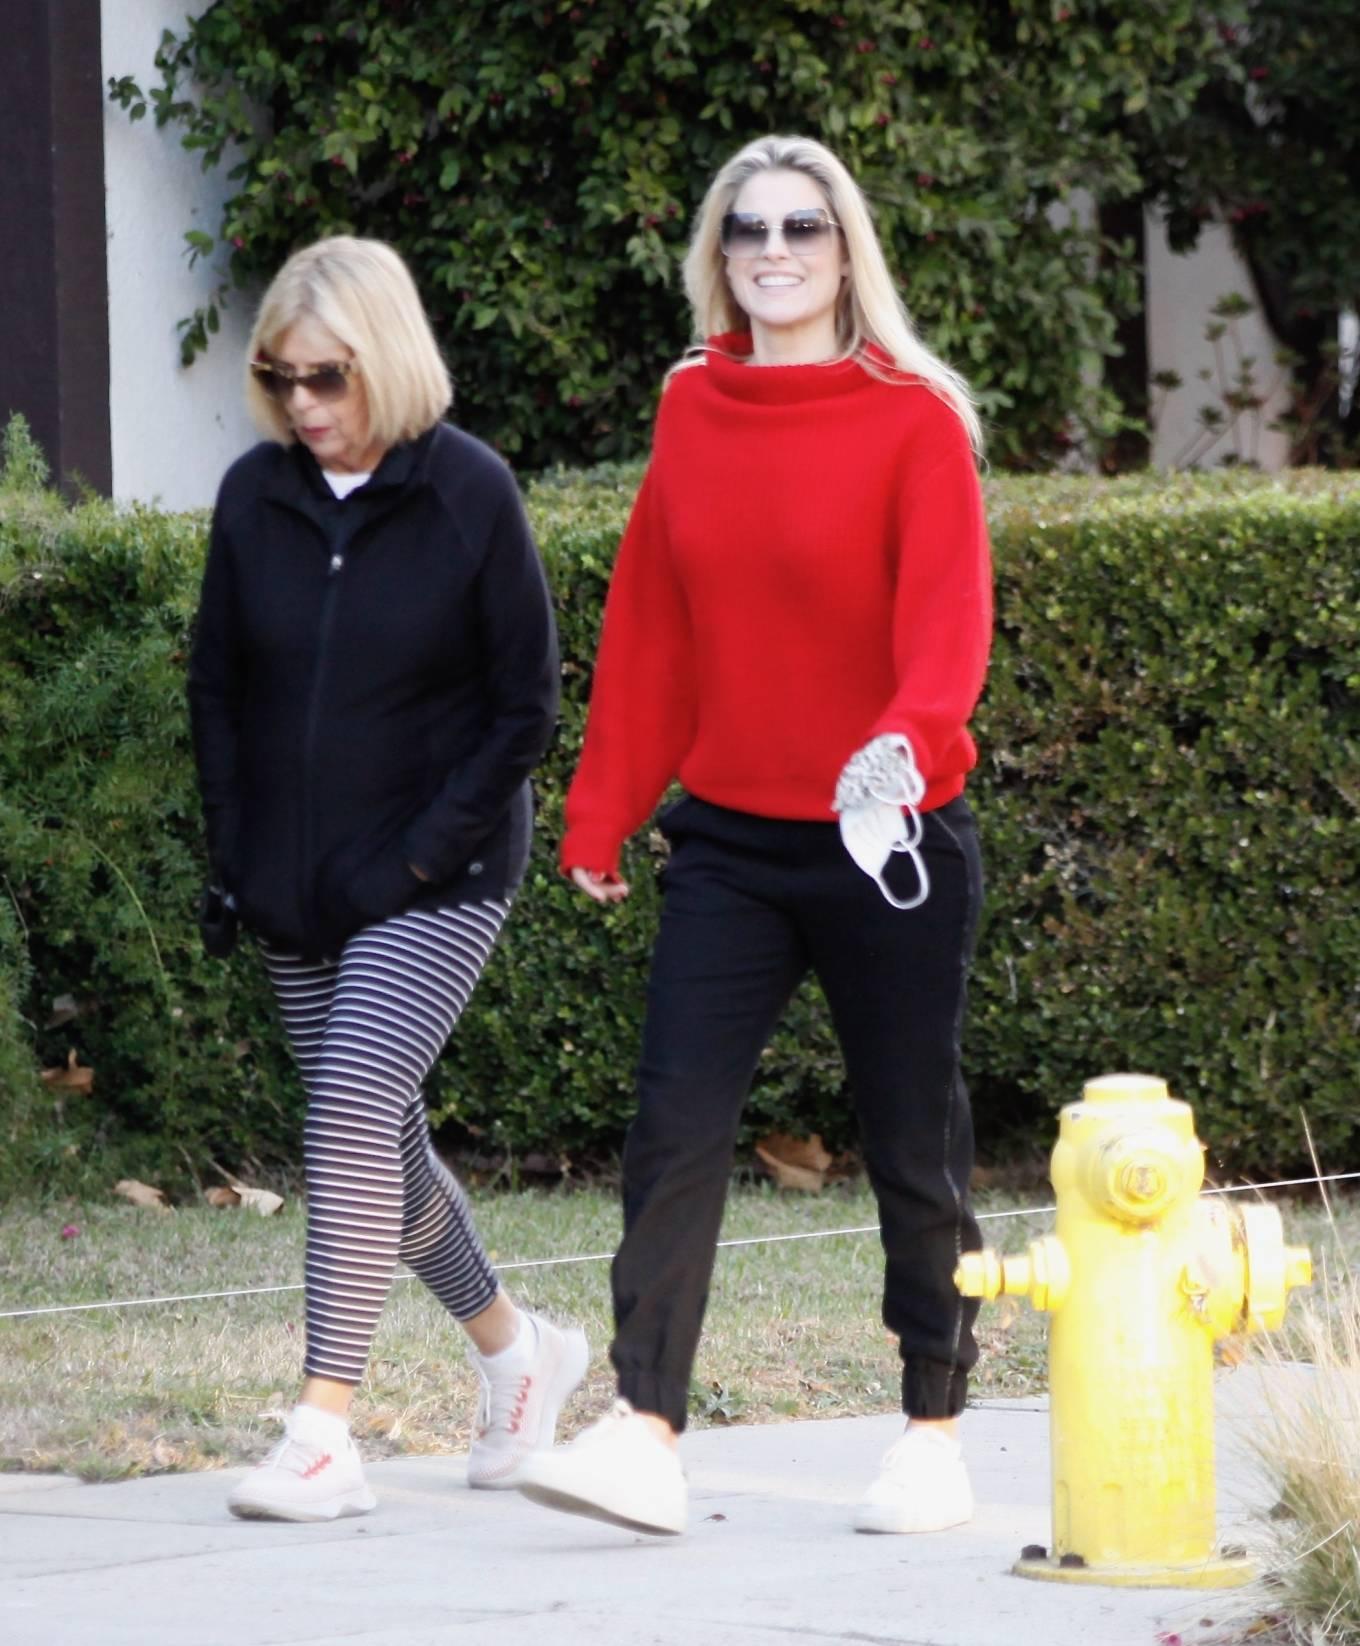 Ali Larter - Seen with her mother in Santa Monica